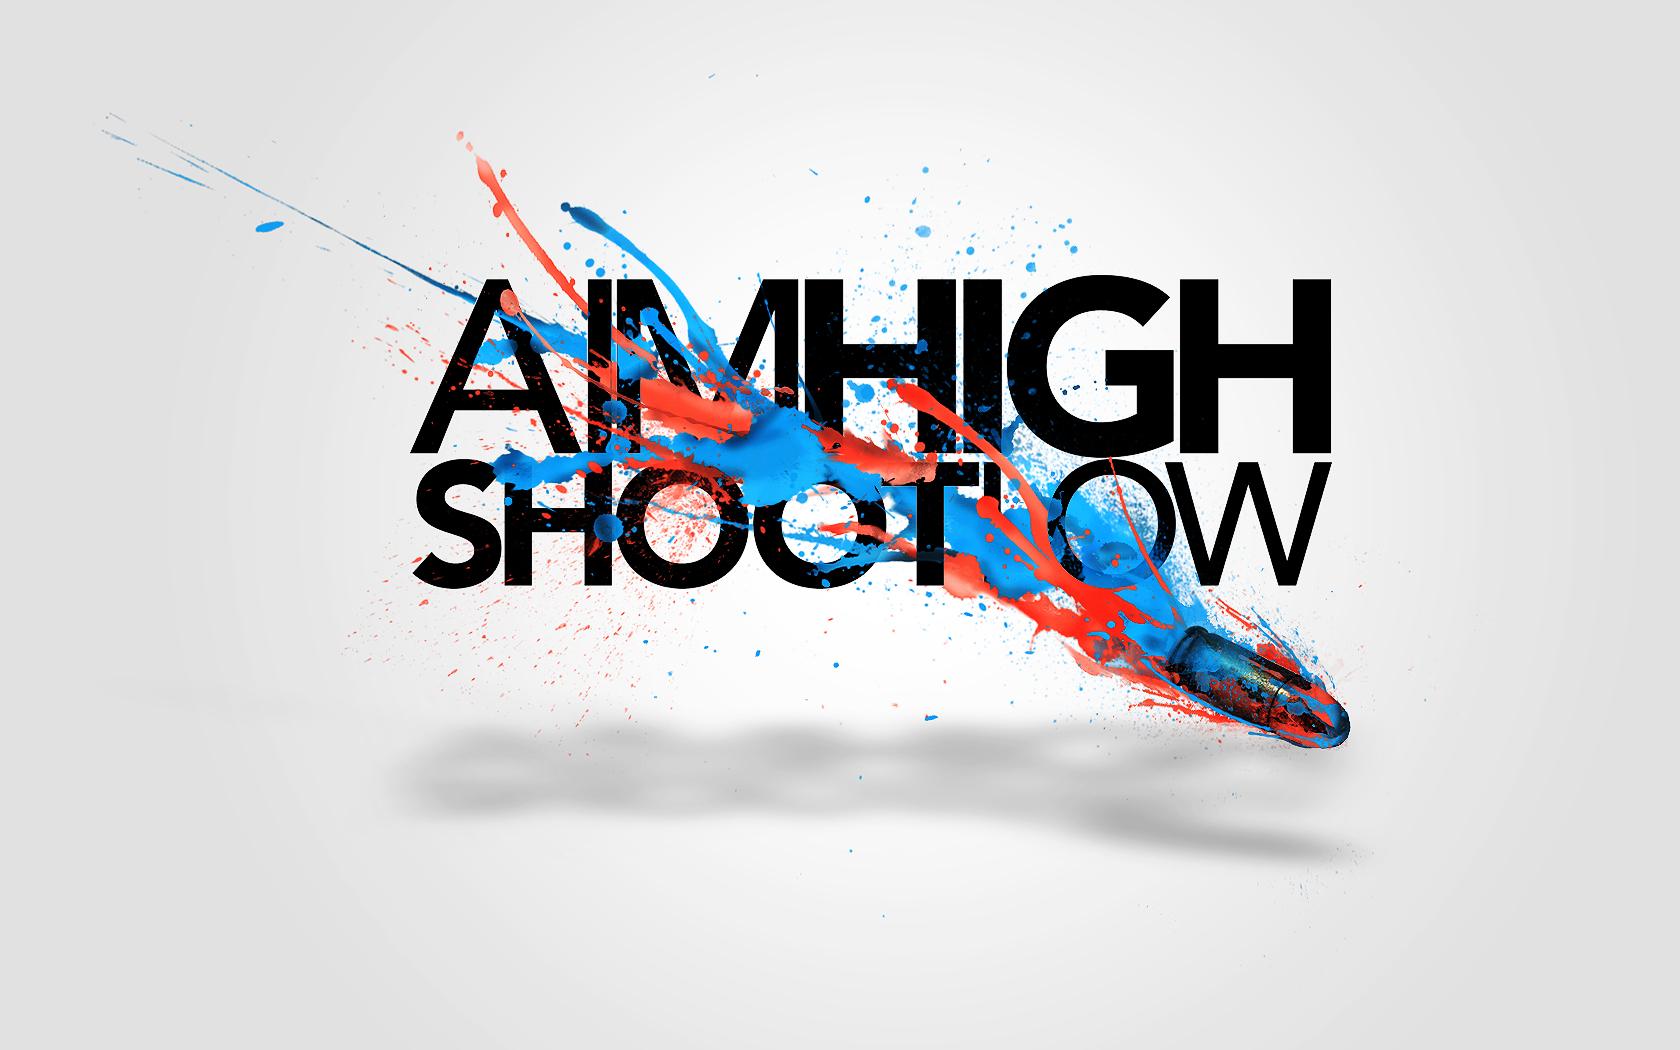 Aim High, Shoot Low